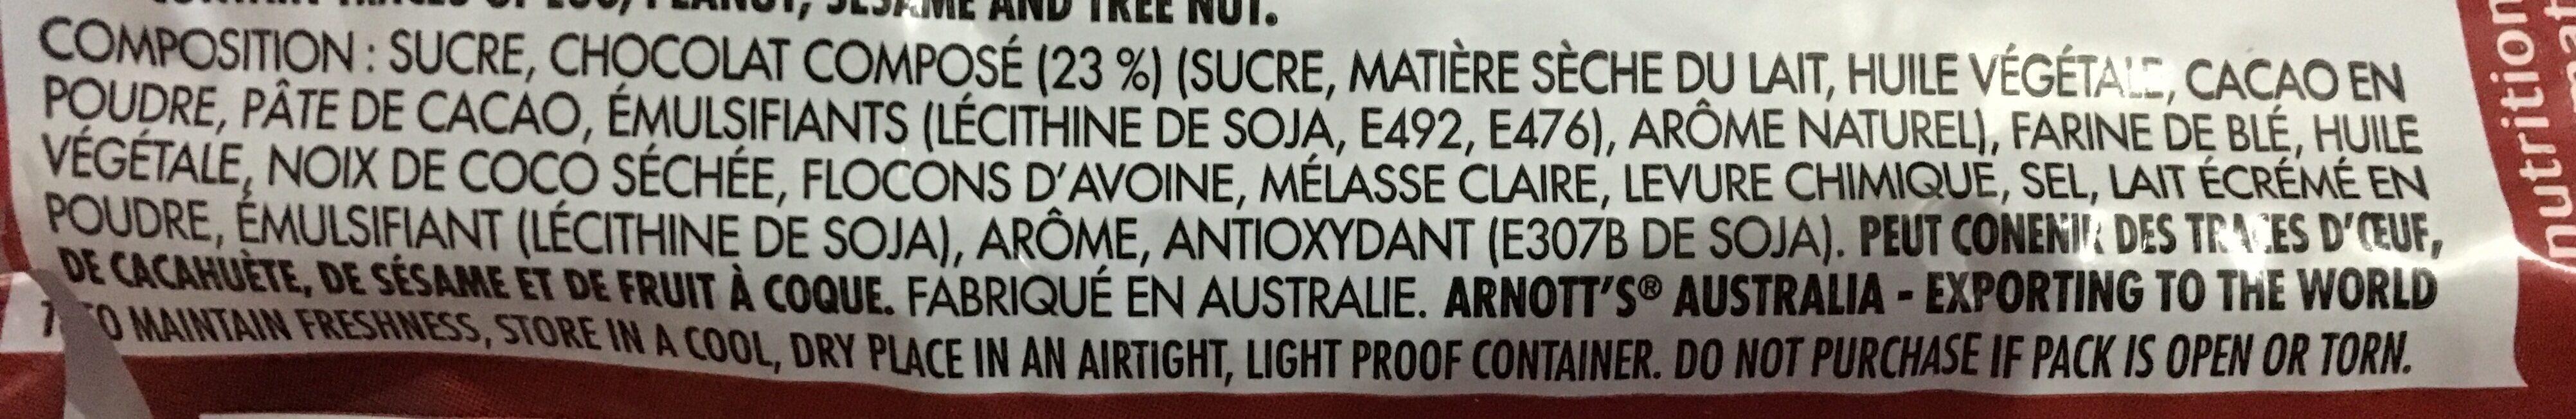 Arnott's Kingston Biscuits 200G - Ingrédients - fr